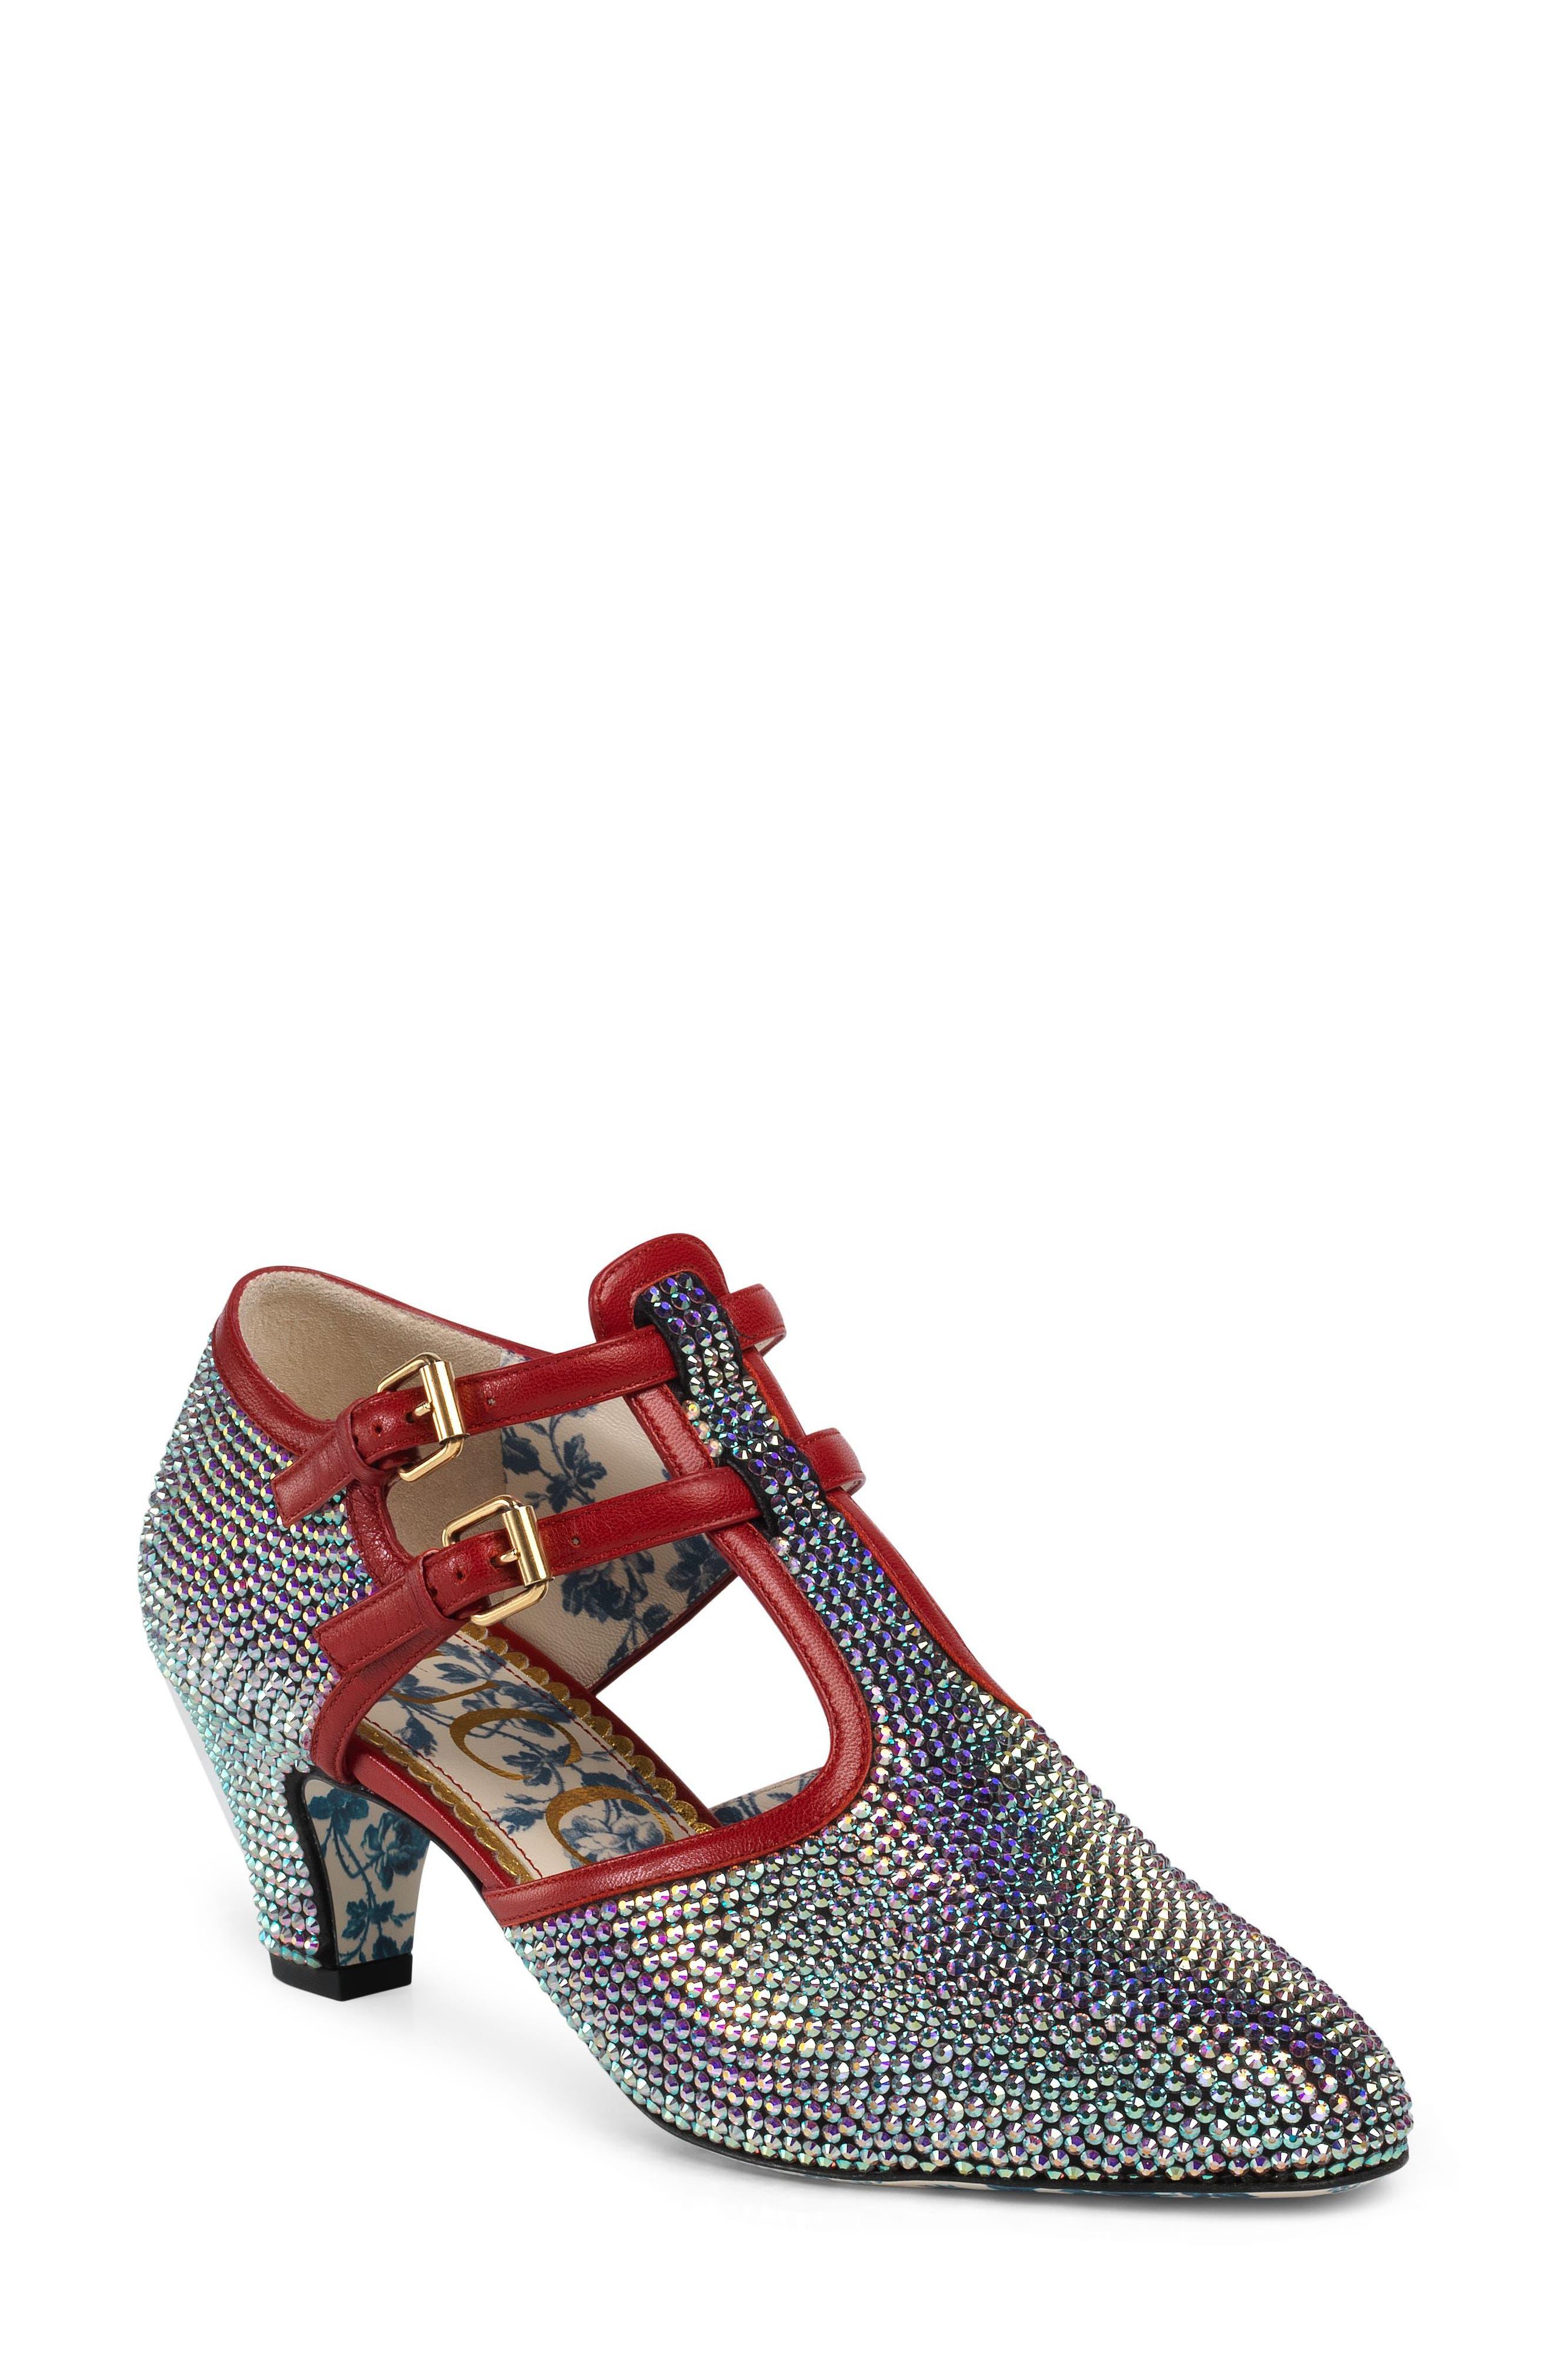 Gucci Mila Crystal Embellished T-Strap Pump, Metallic